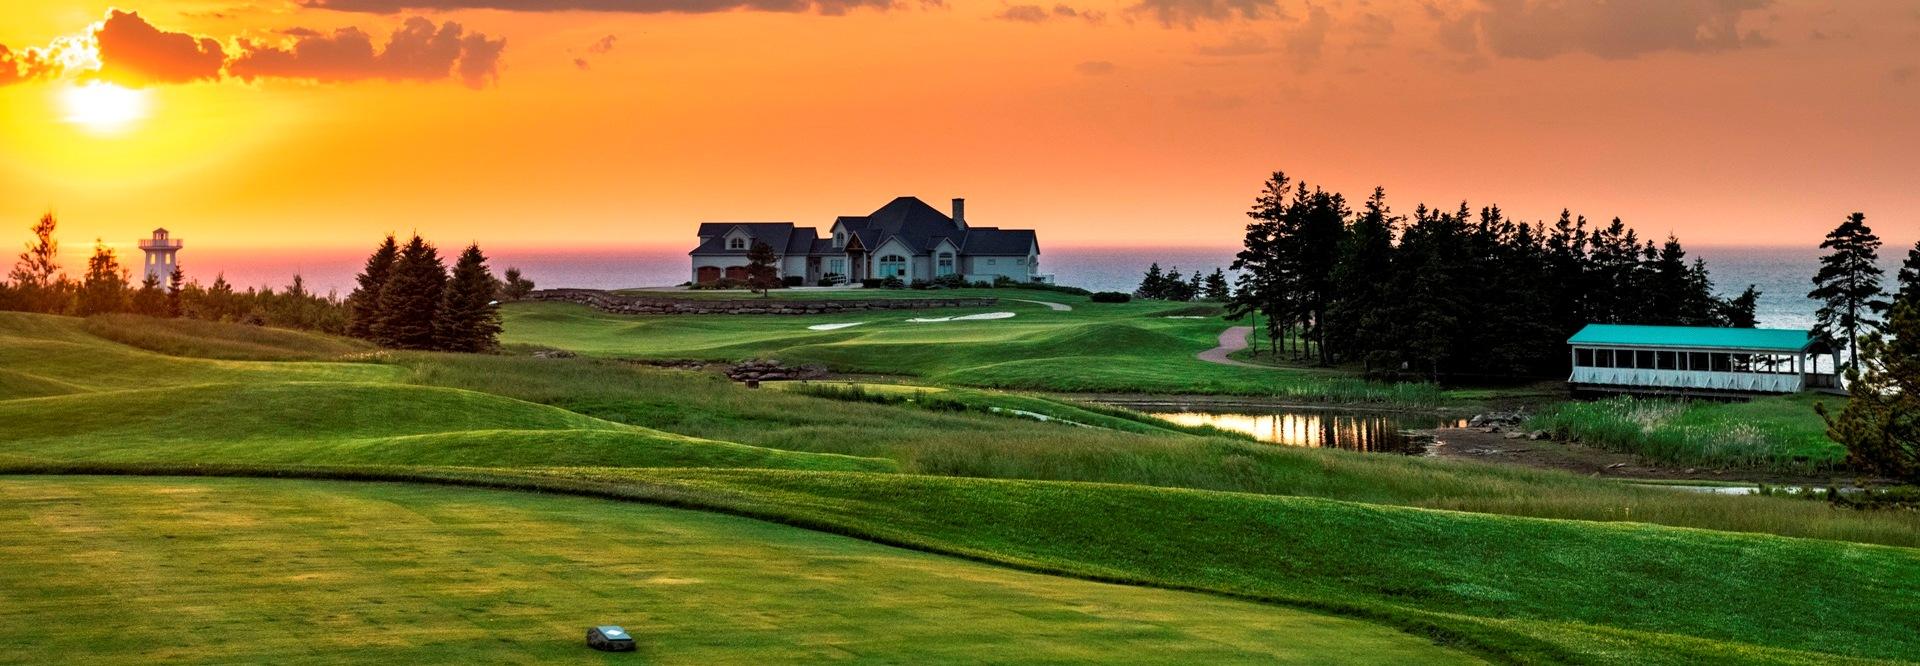 Championship Golf Course